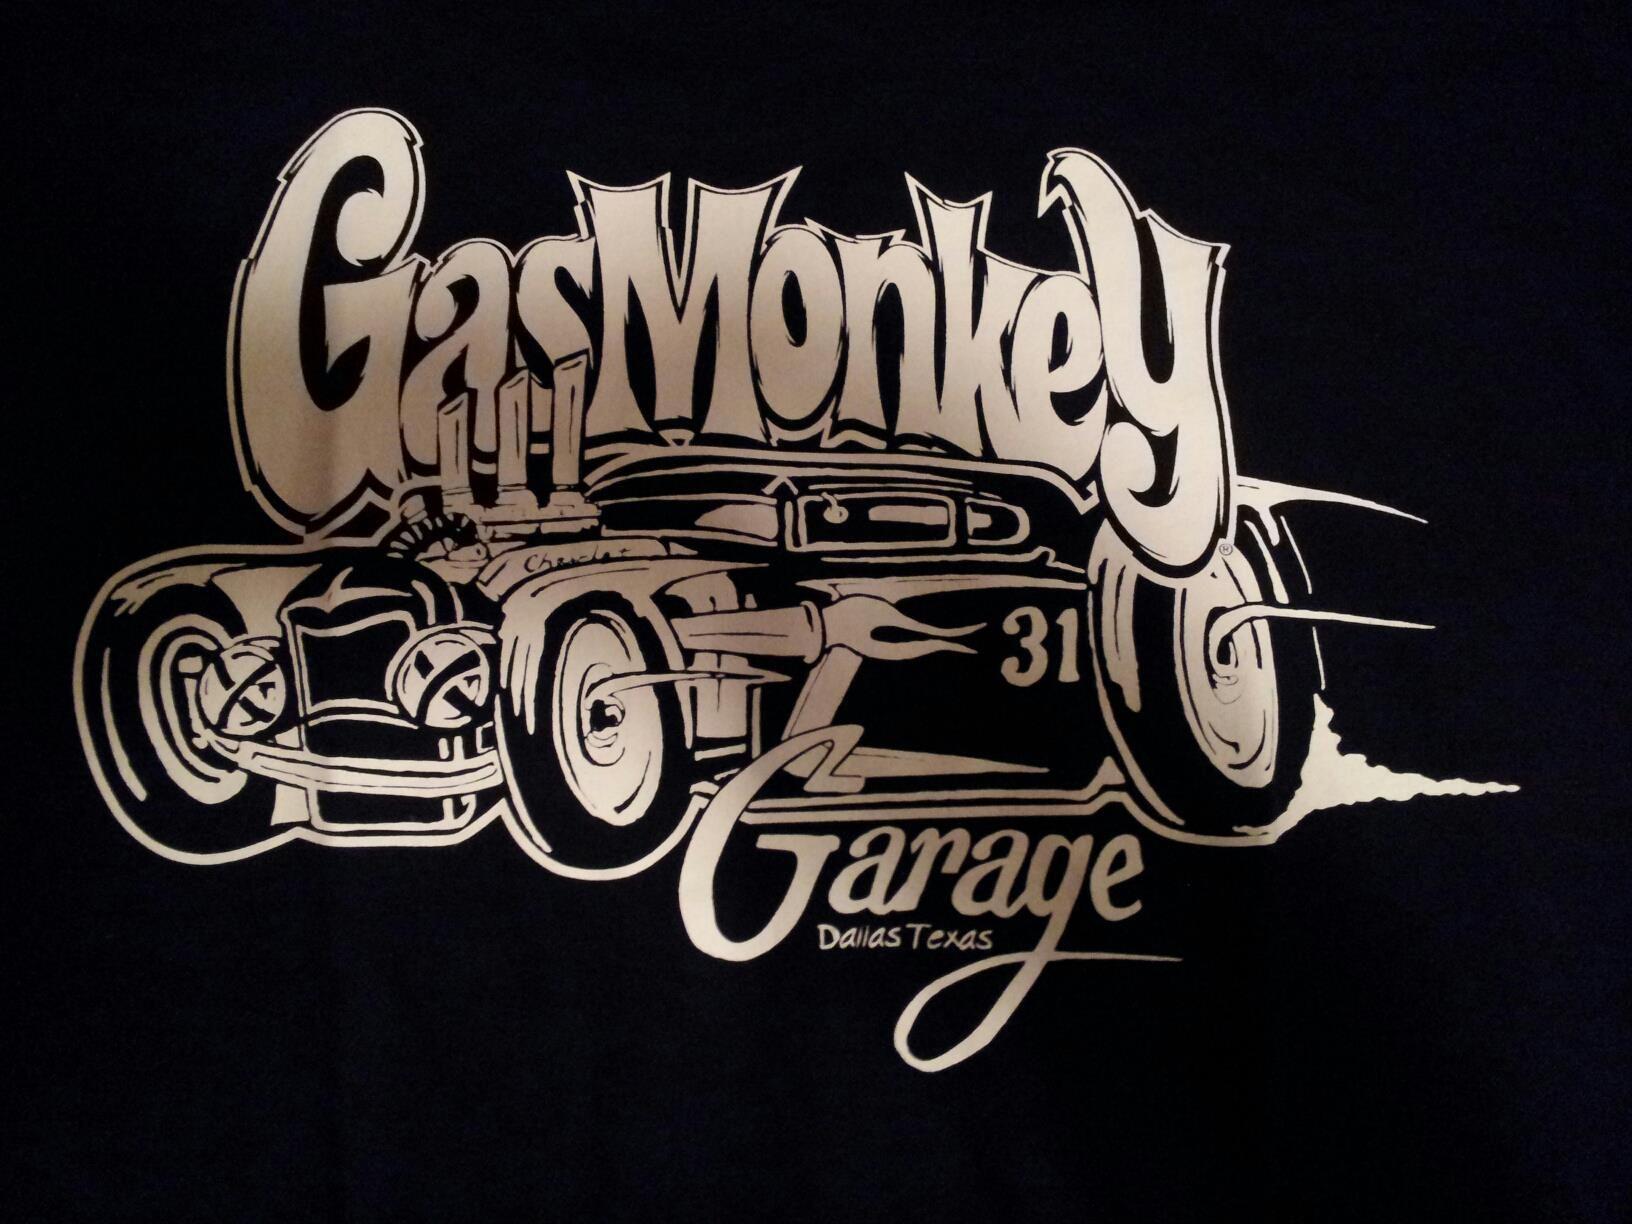 Gas Monkey garage, Fast N loud TV show #gasmonkeygarage Gas Monkey garage, Fast N loud TV show #gasmonkeygarage Gas Monkey garage, Fast N loud TV show #gasmonkeygarage Gas Monkey garage, Fast N loud TV show #gasmonkeygarage